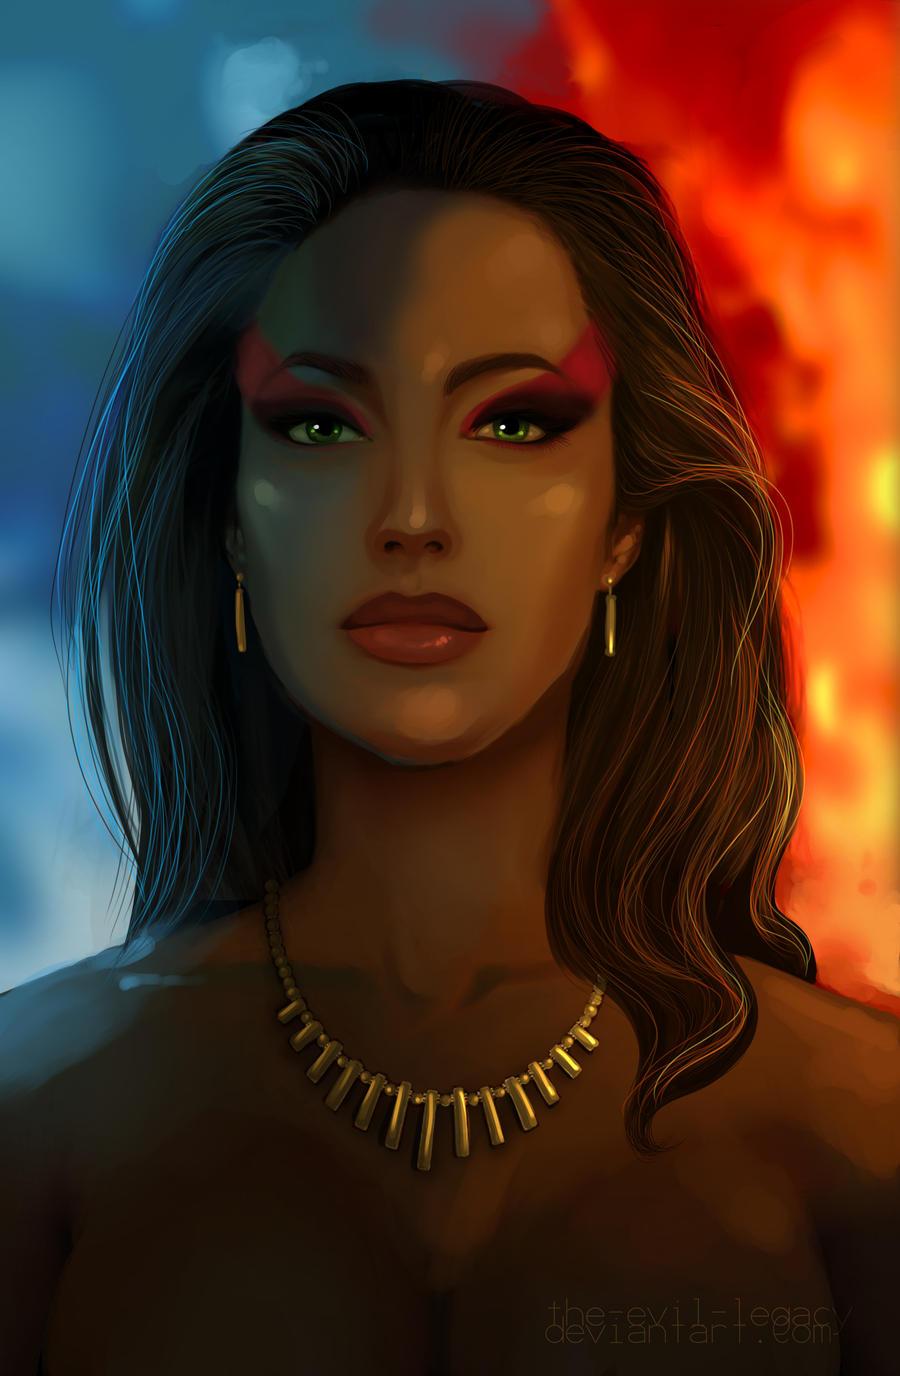 Principe de persia kaileena desnuda sexual queen